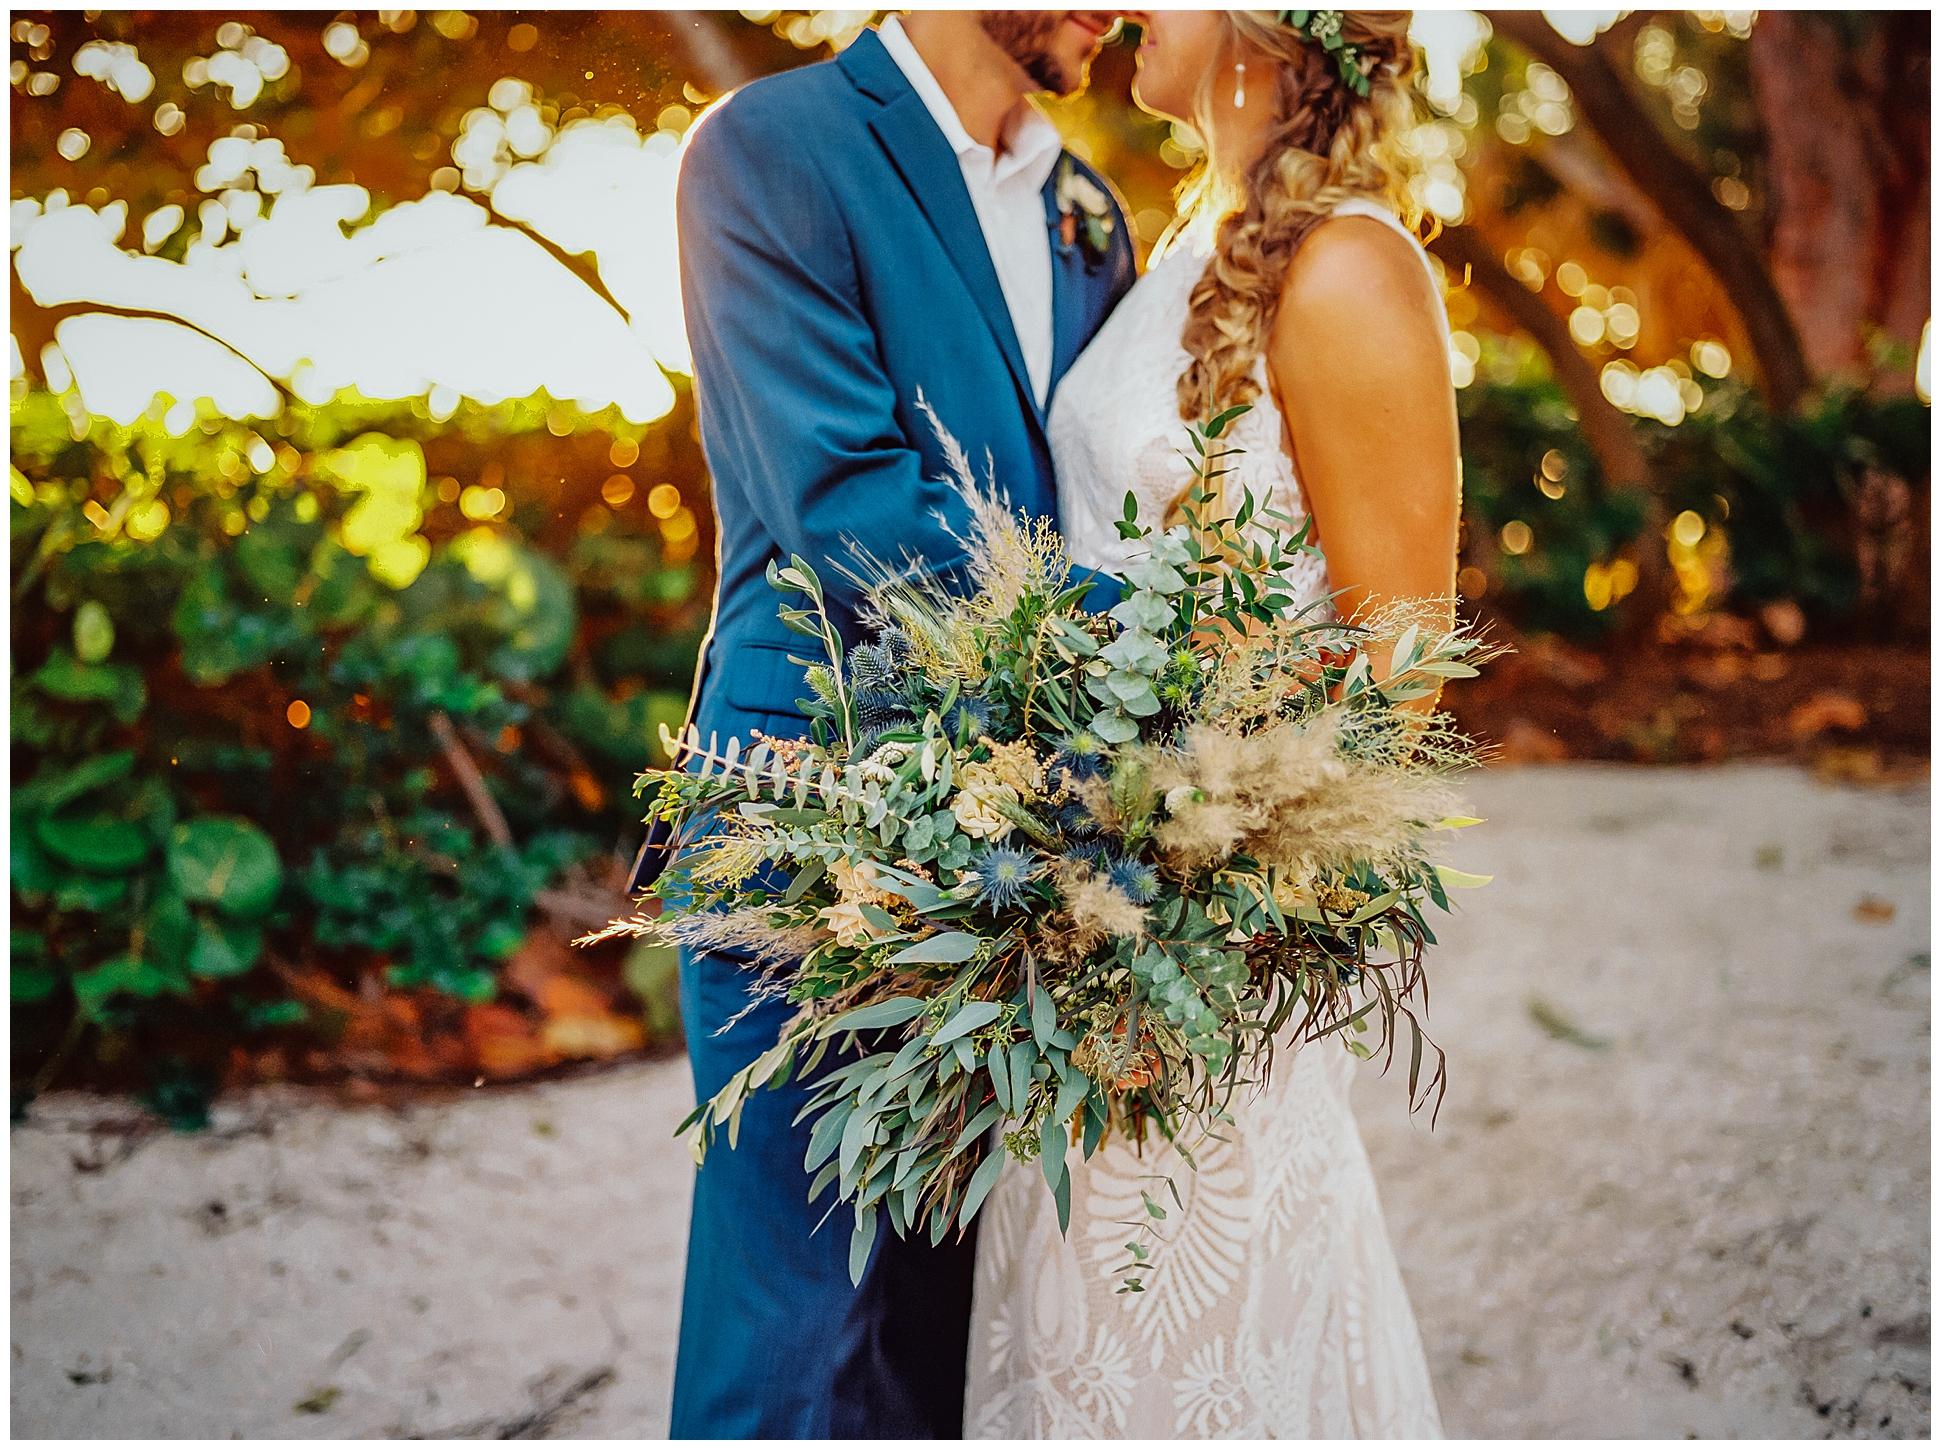 medium-format-film-vs-digital-wedding-photography-florida-beach_0016.jpg